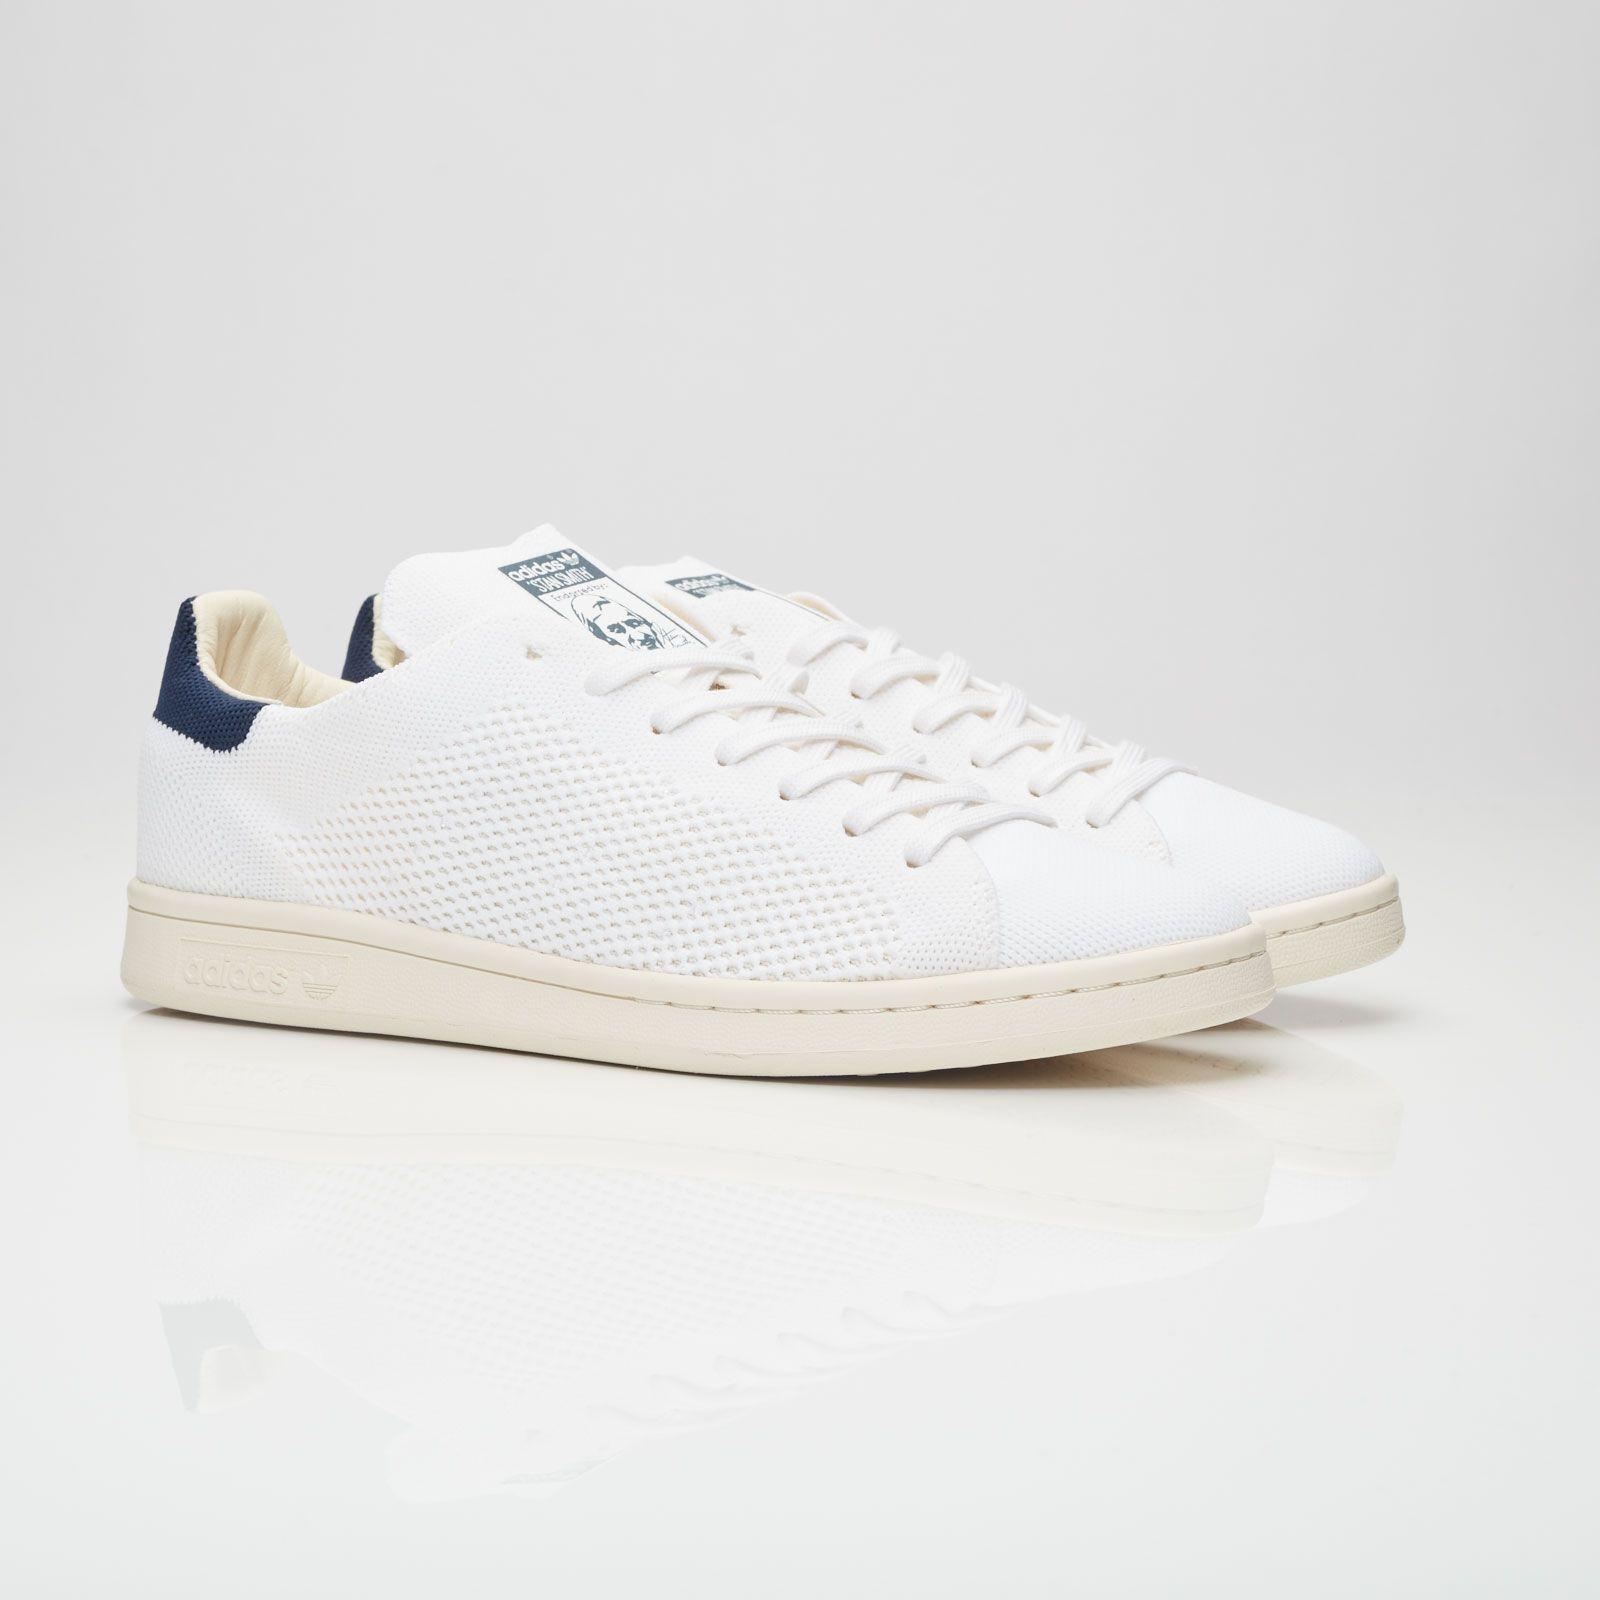 adidas Stan Smith OG Primeknit | Adidas